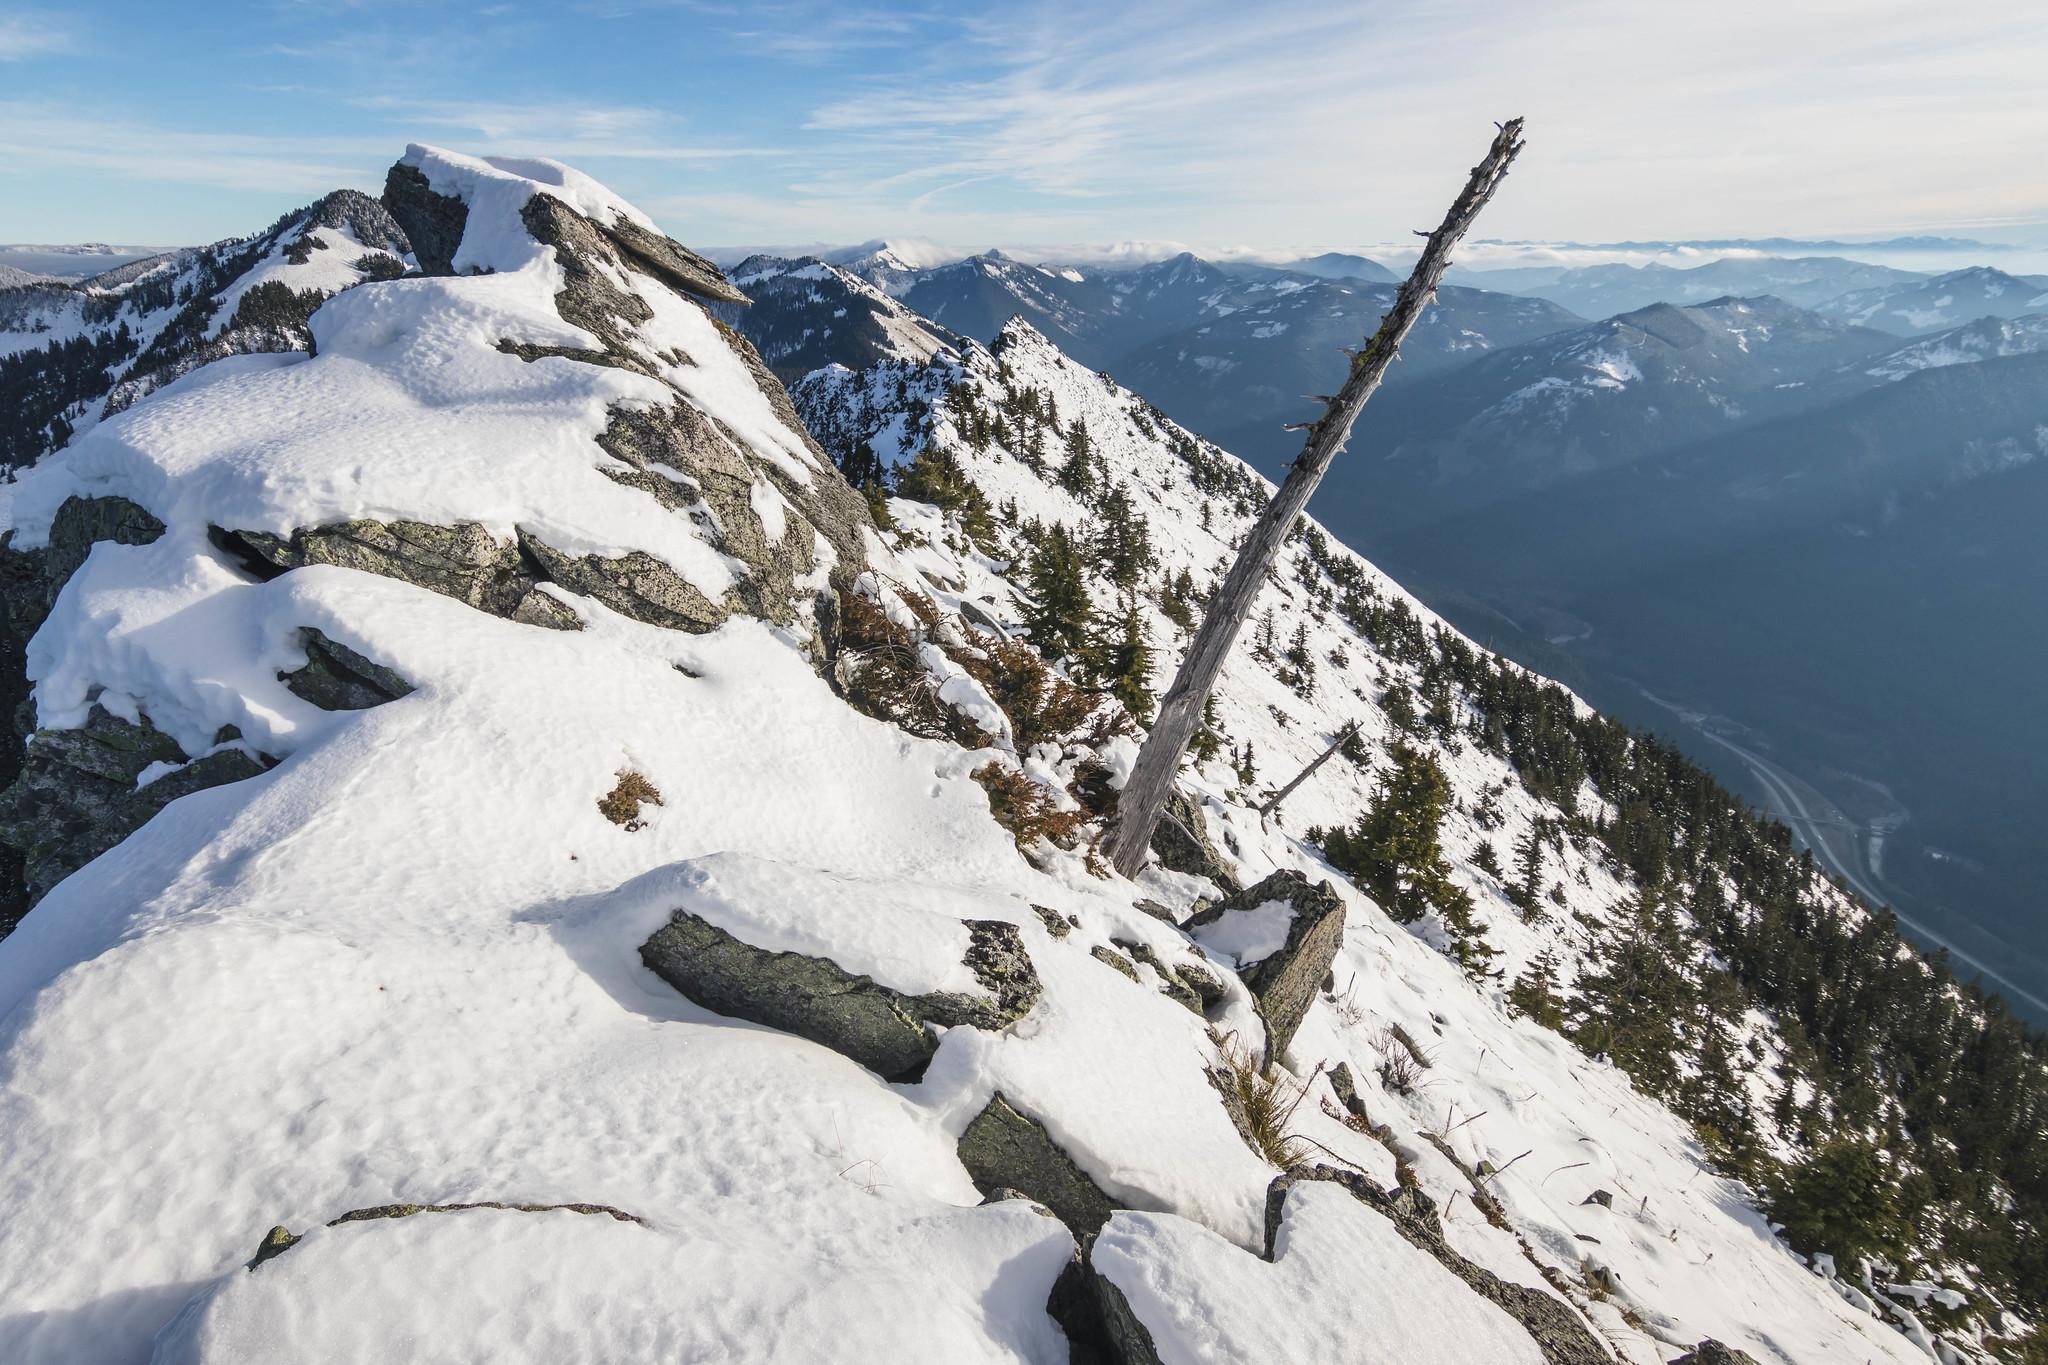 Looking back at Putrid Petes Peak